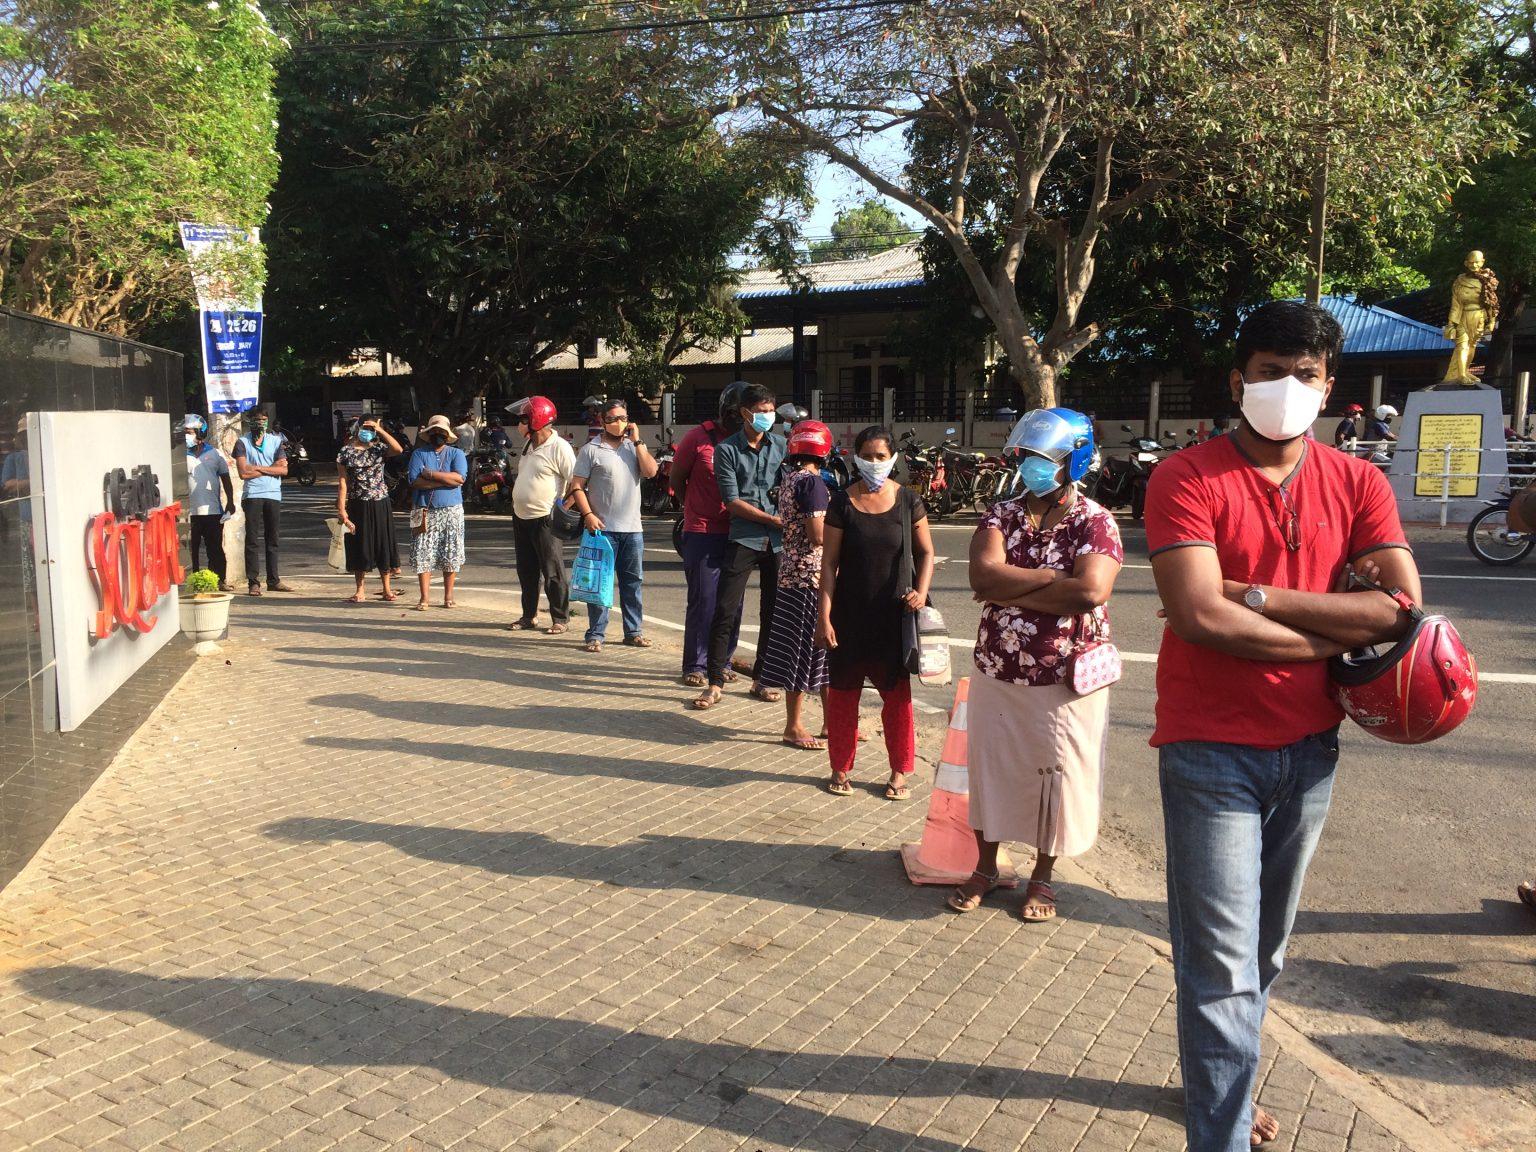 Curfew-Release-Time-Jaffna-Situation-Coronavirus-Alert-Situation-11-1536x1152